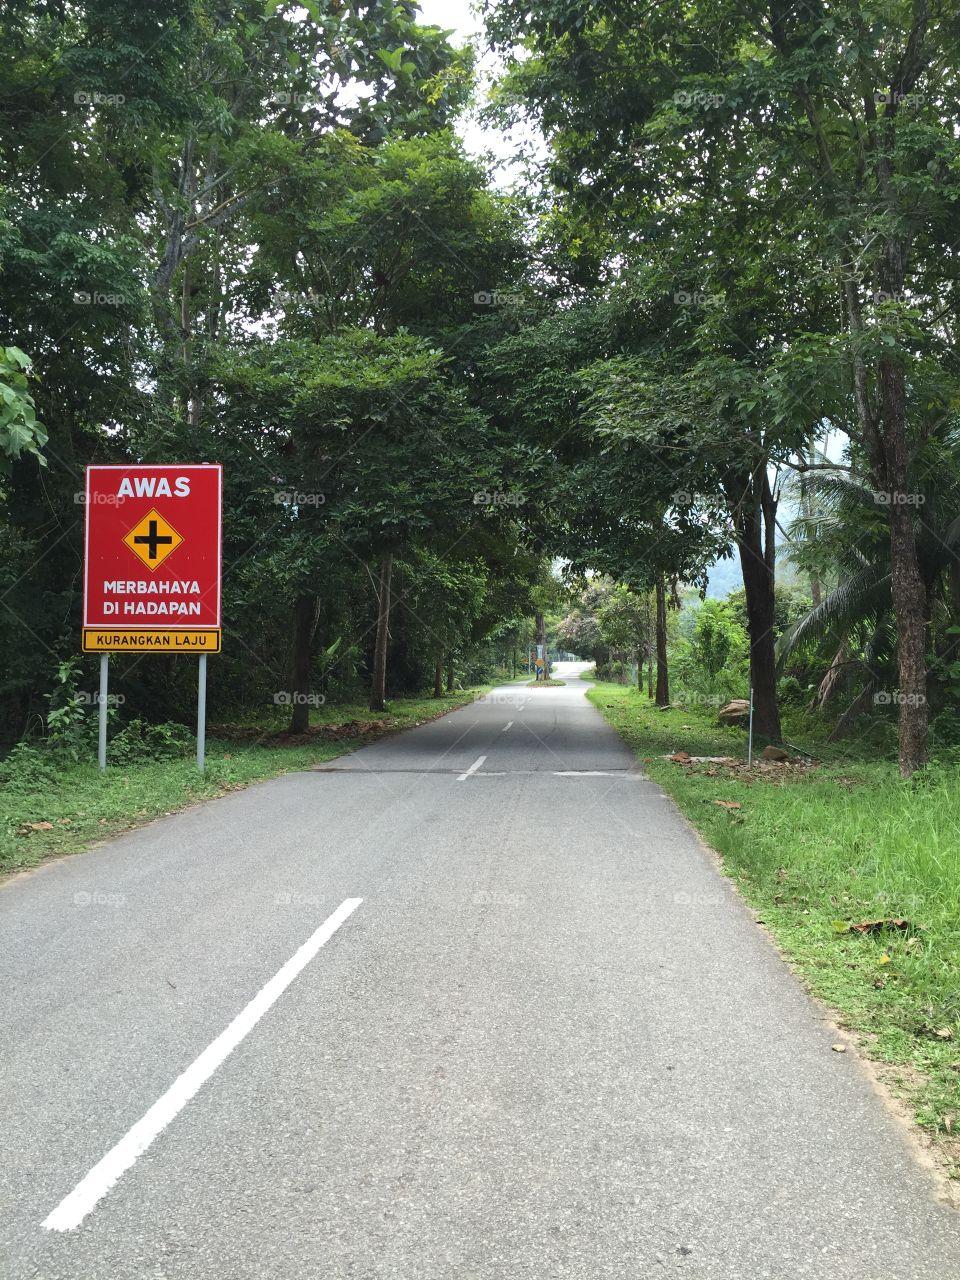 Road to waterfall in Kedah, Malaysia. Taken on 19 April 2015